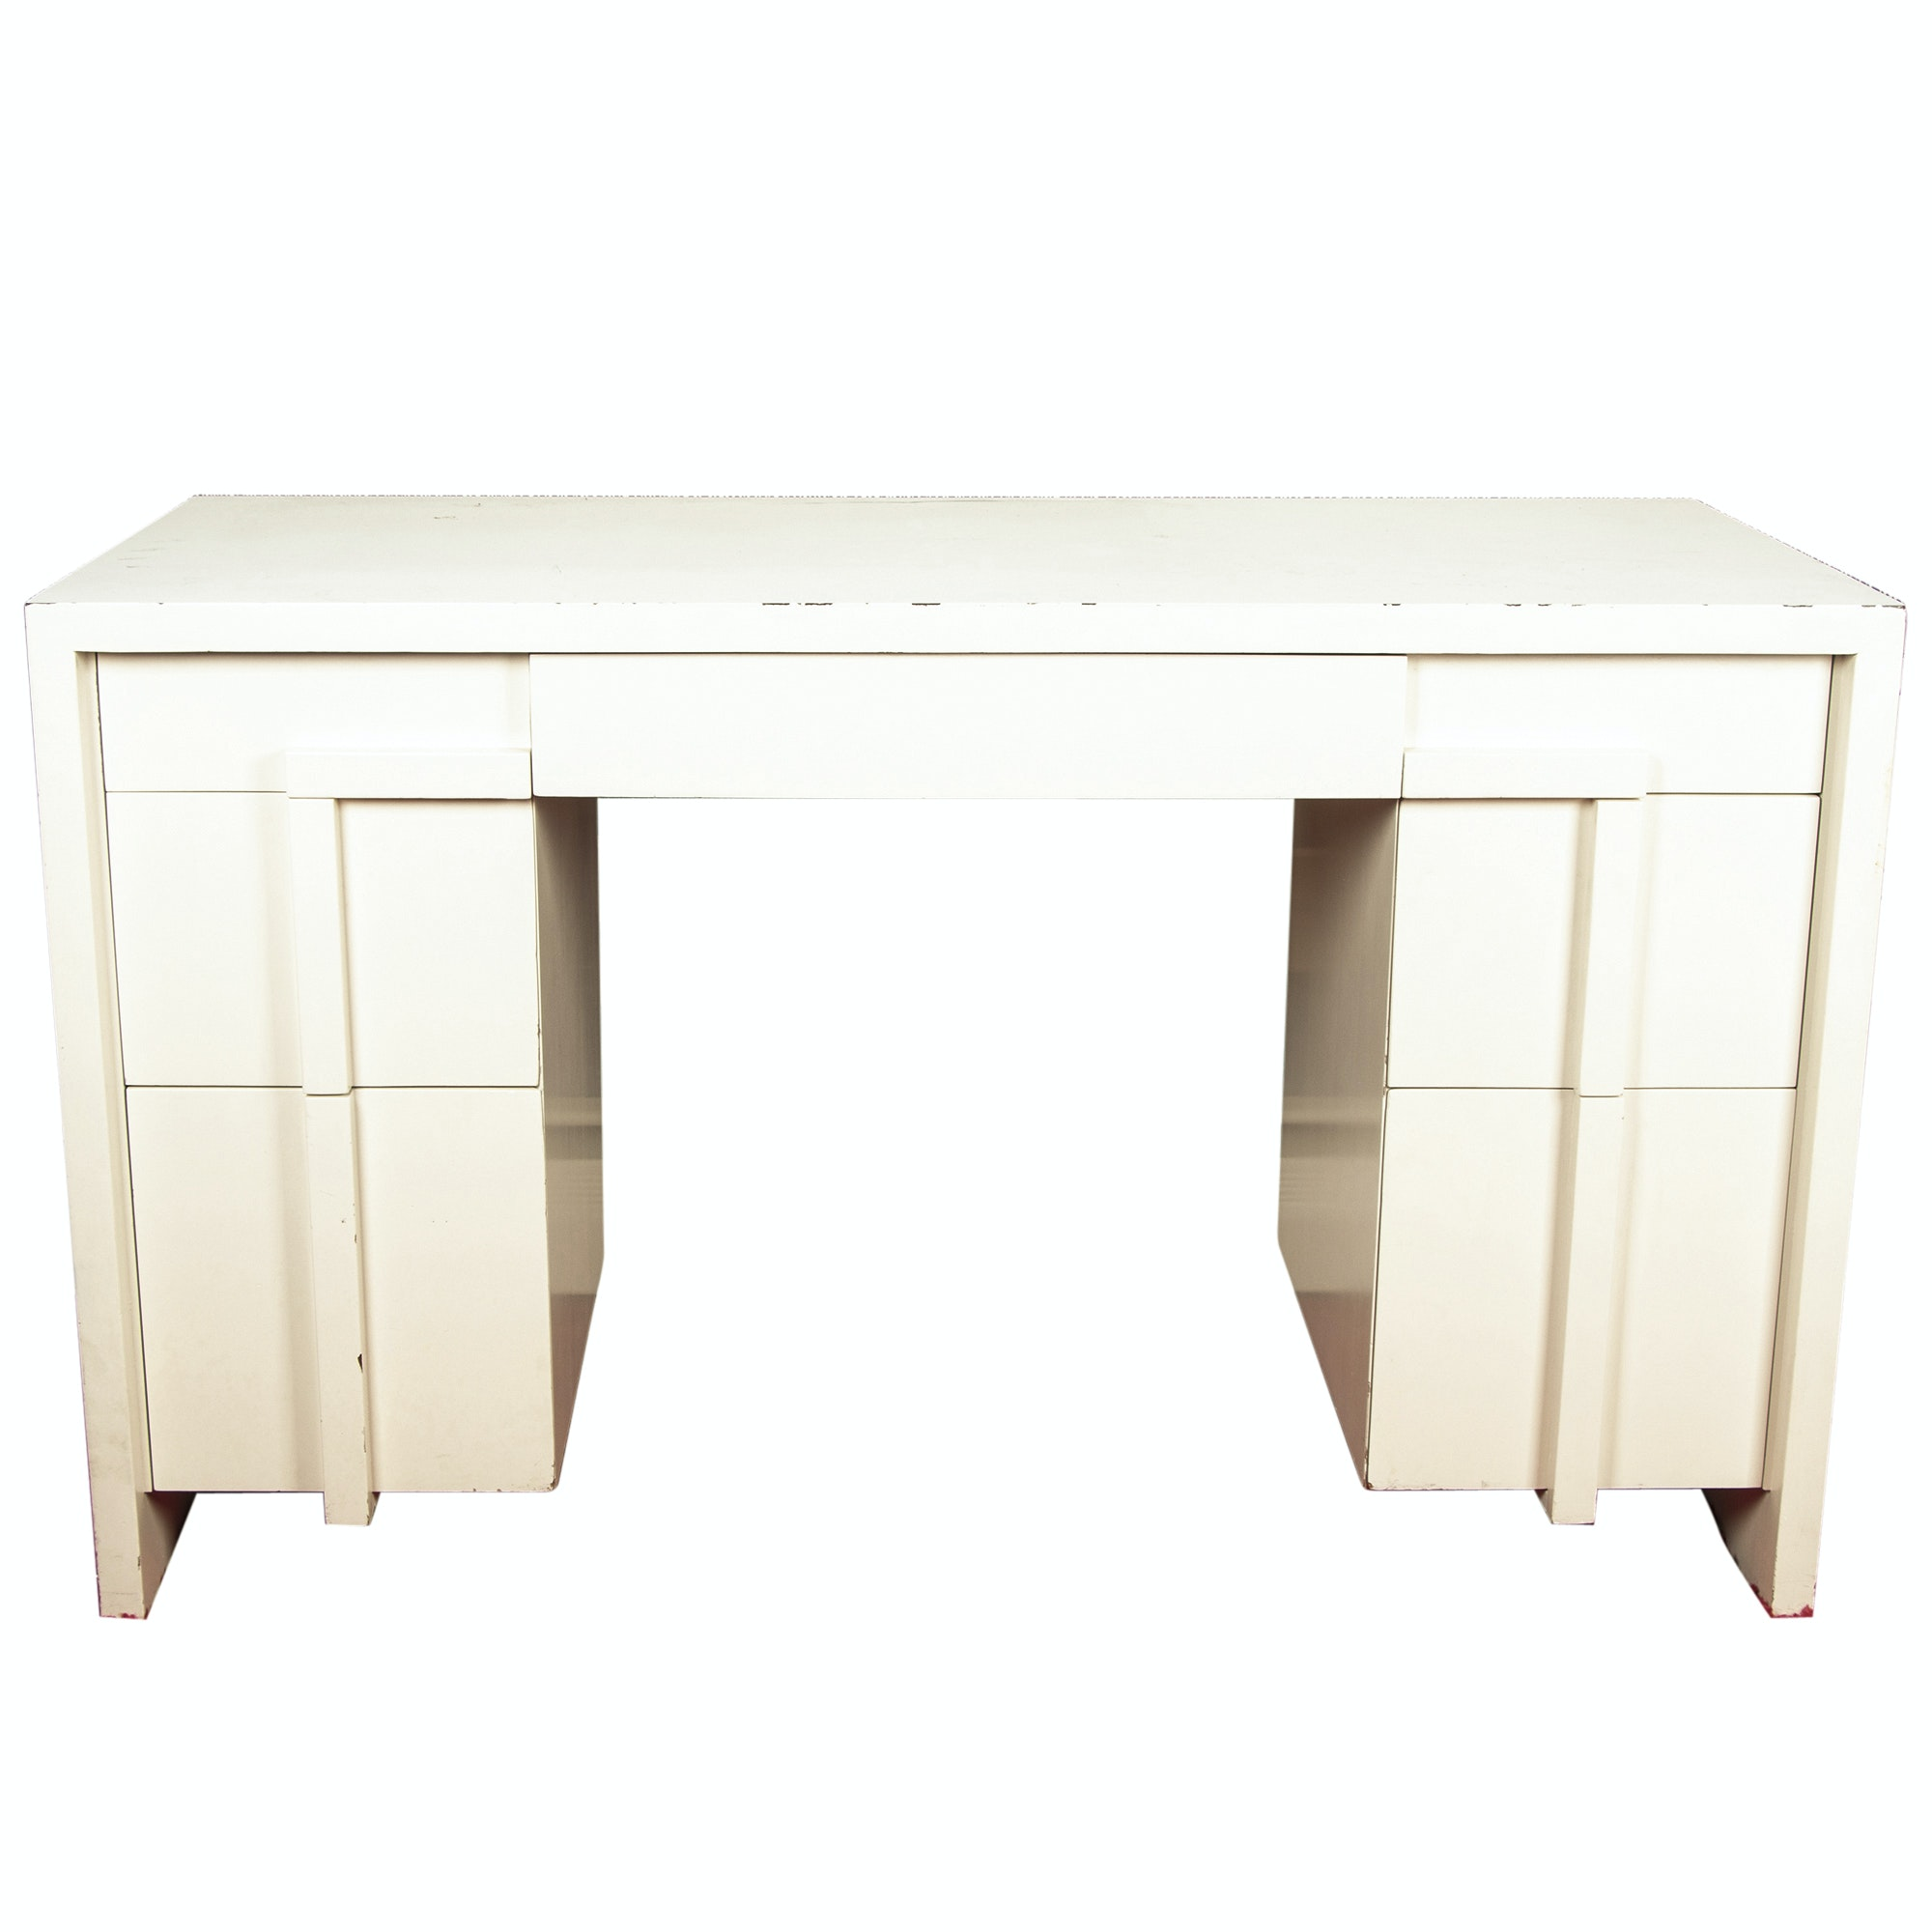 Mid Century Modern Painted Wood Desk by Widdicomb, Mid-20th Century